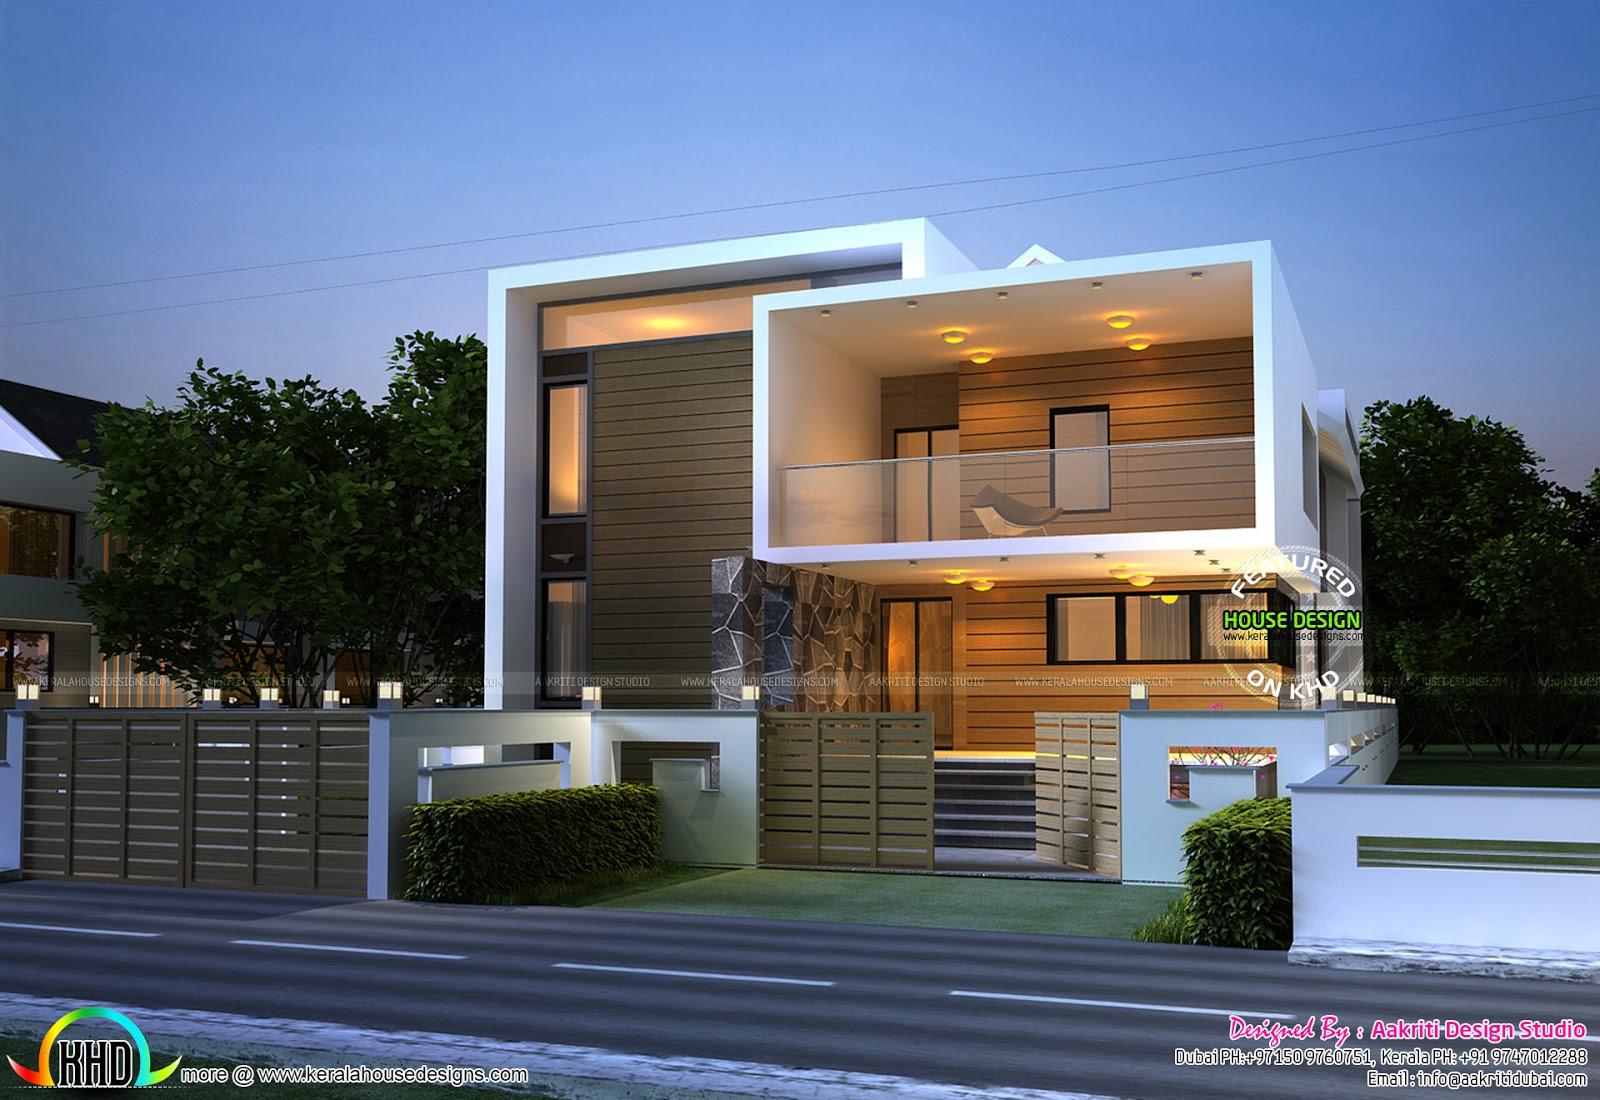 Cute Box Model Home With Basement Floor Kerala Home